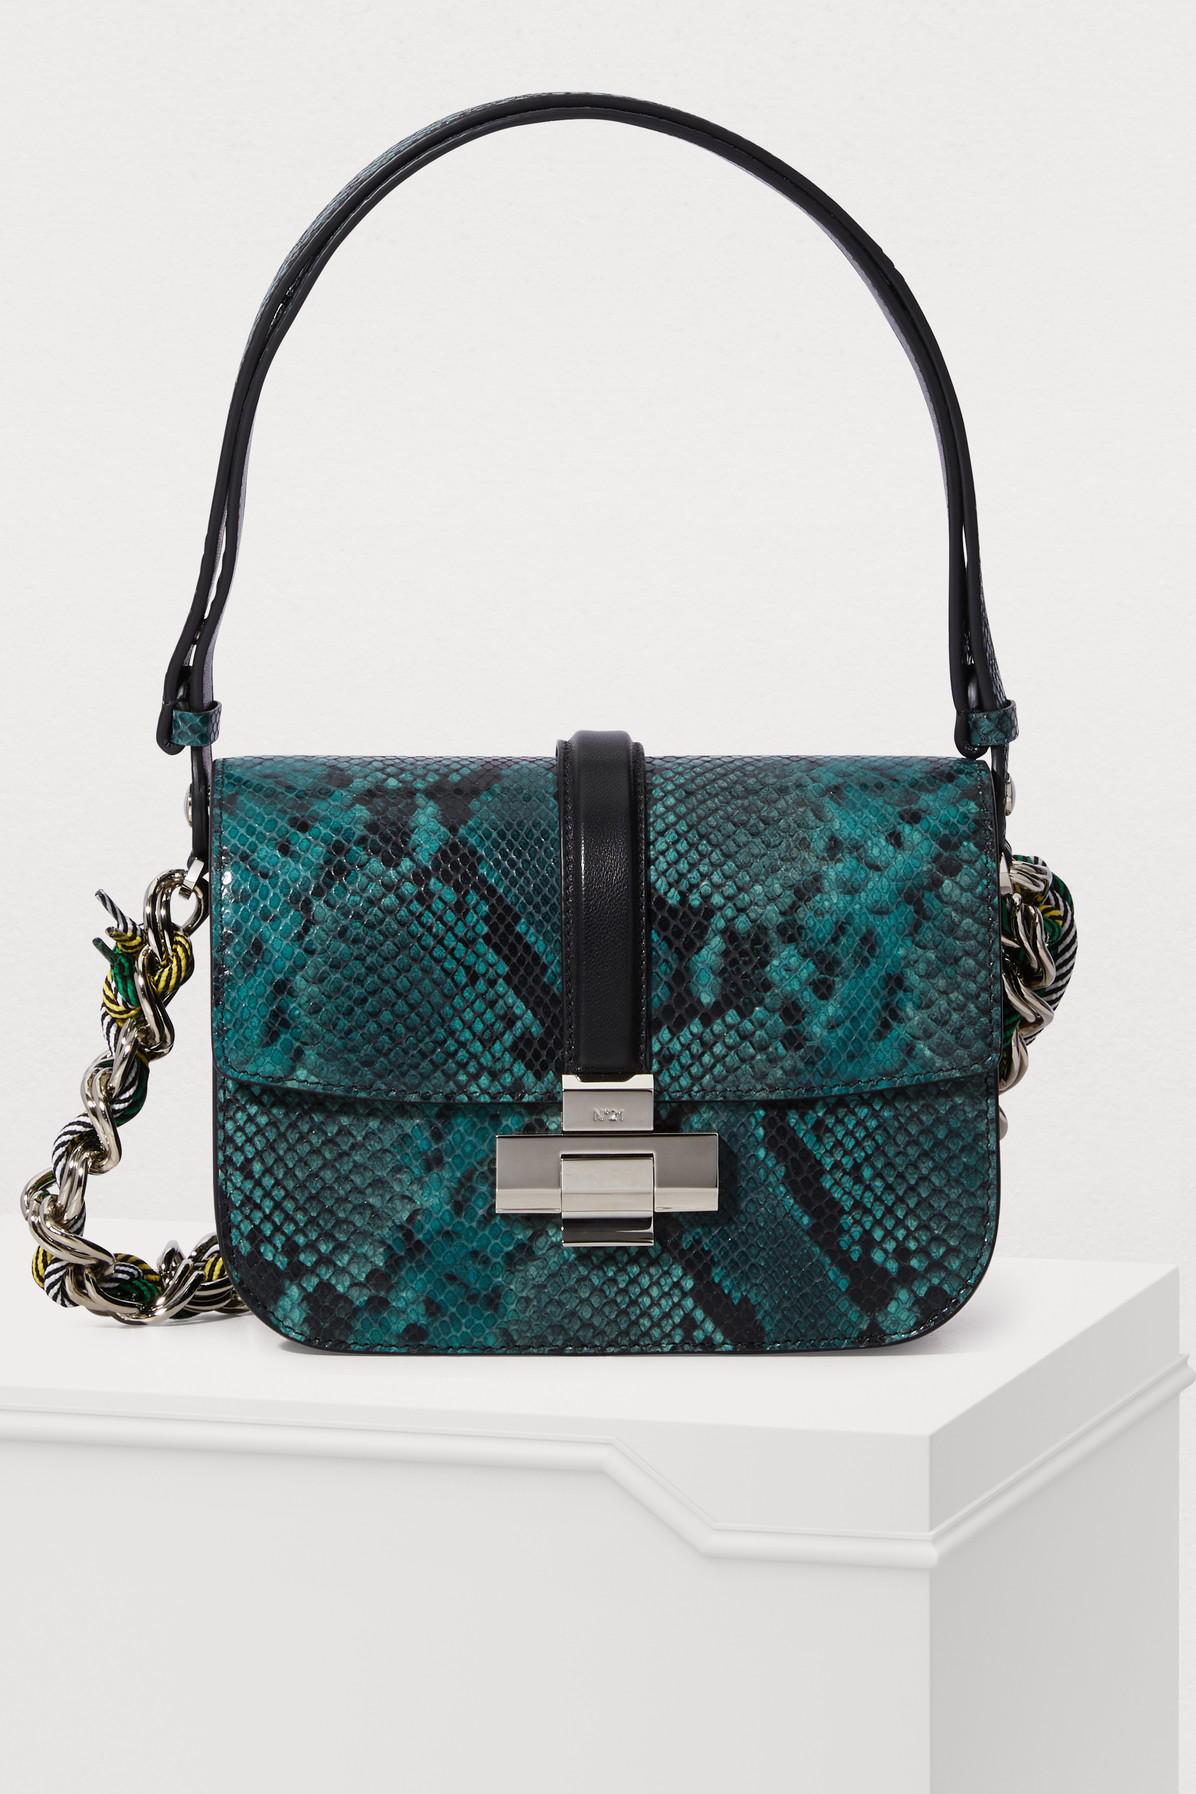 N°21 Lolita Shoulder Bag In Green